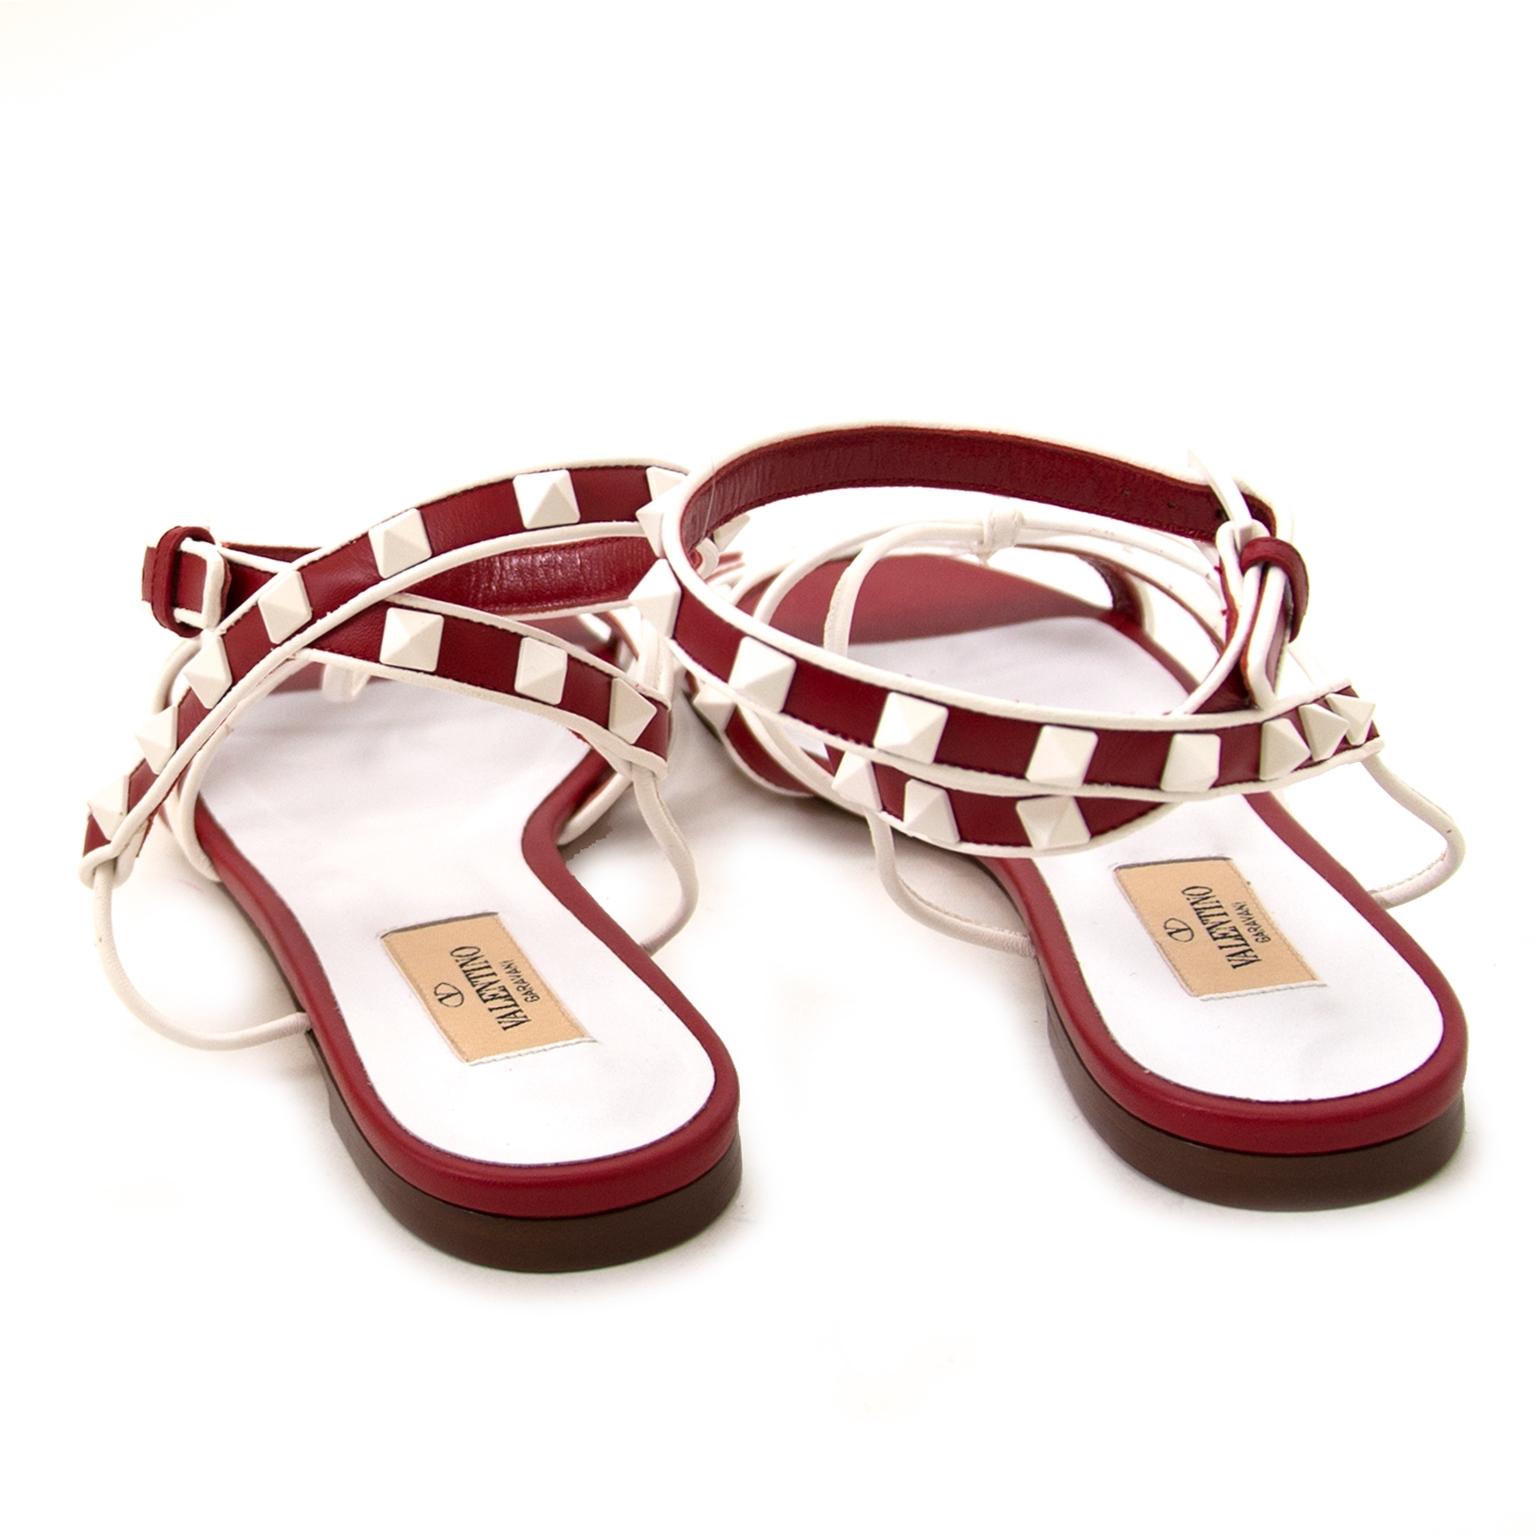 Koop authentieke valentino rockstud sandalen bij labellov vintage mode webshop belgië